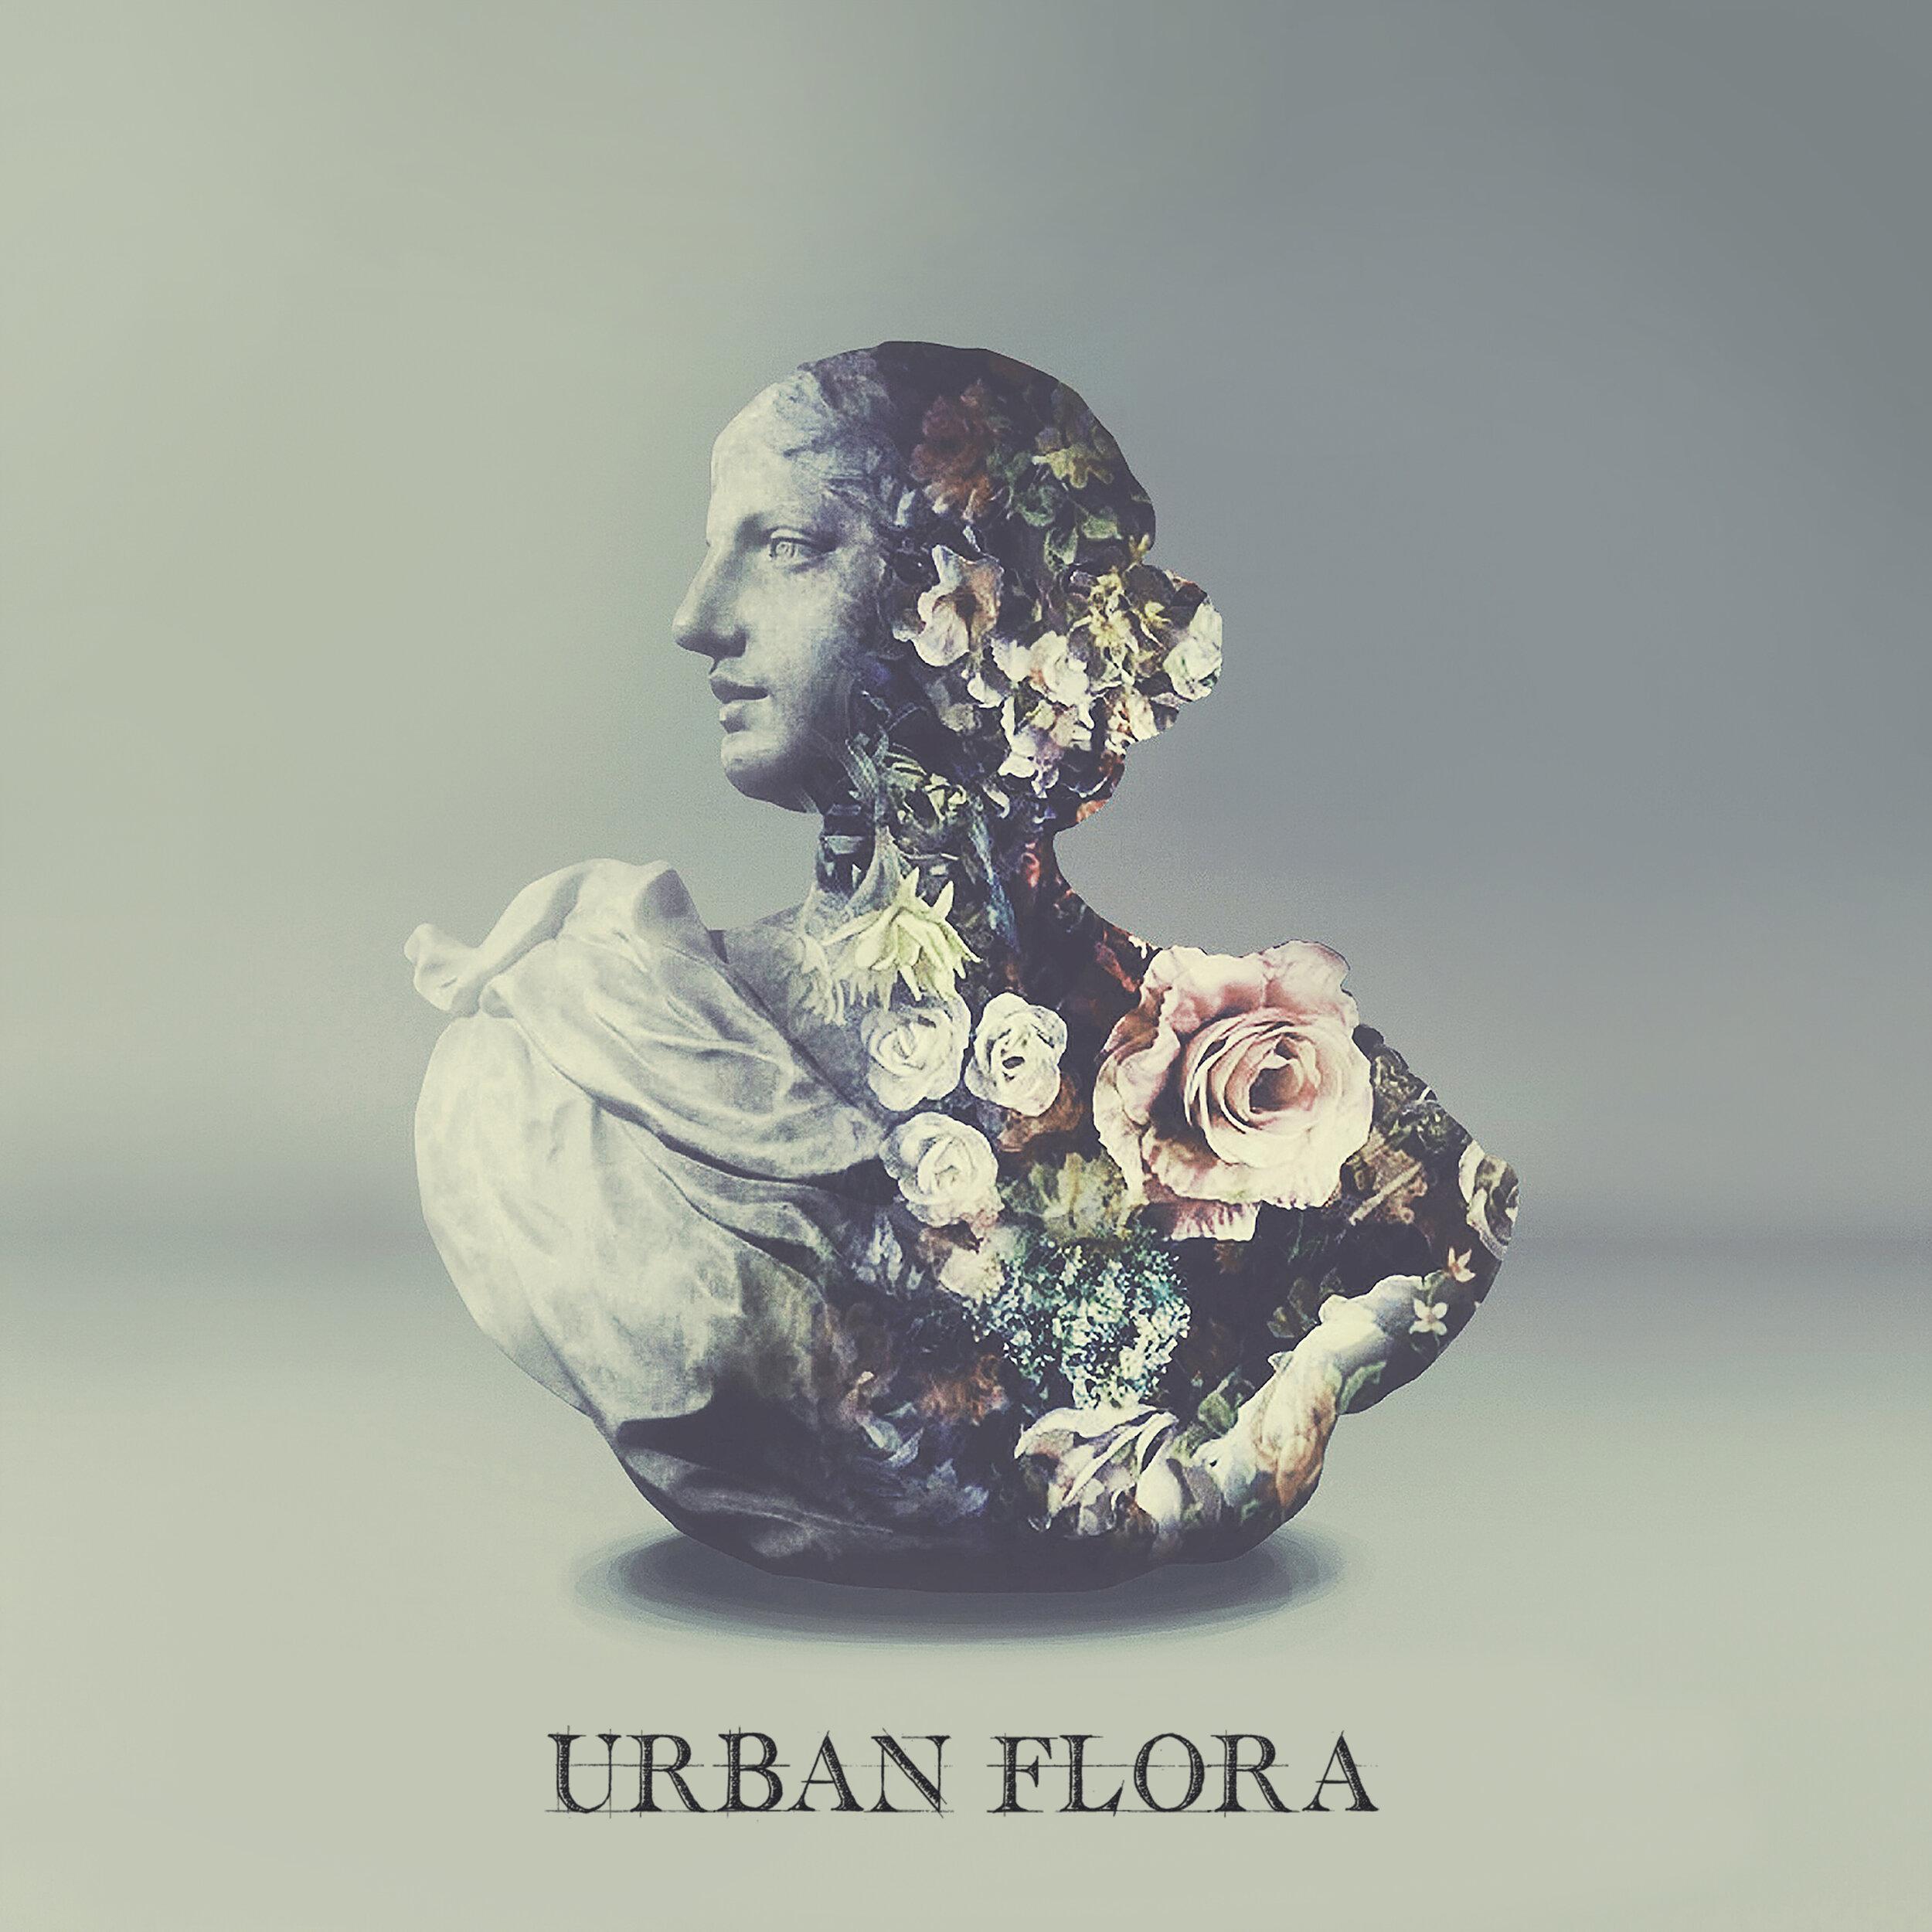 Urban Flora Art Front Cover_3000px.jpg